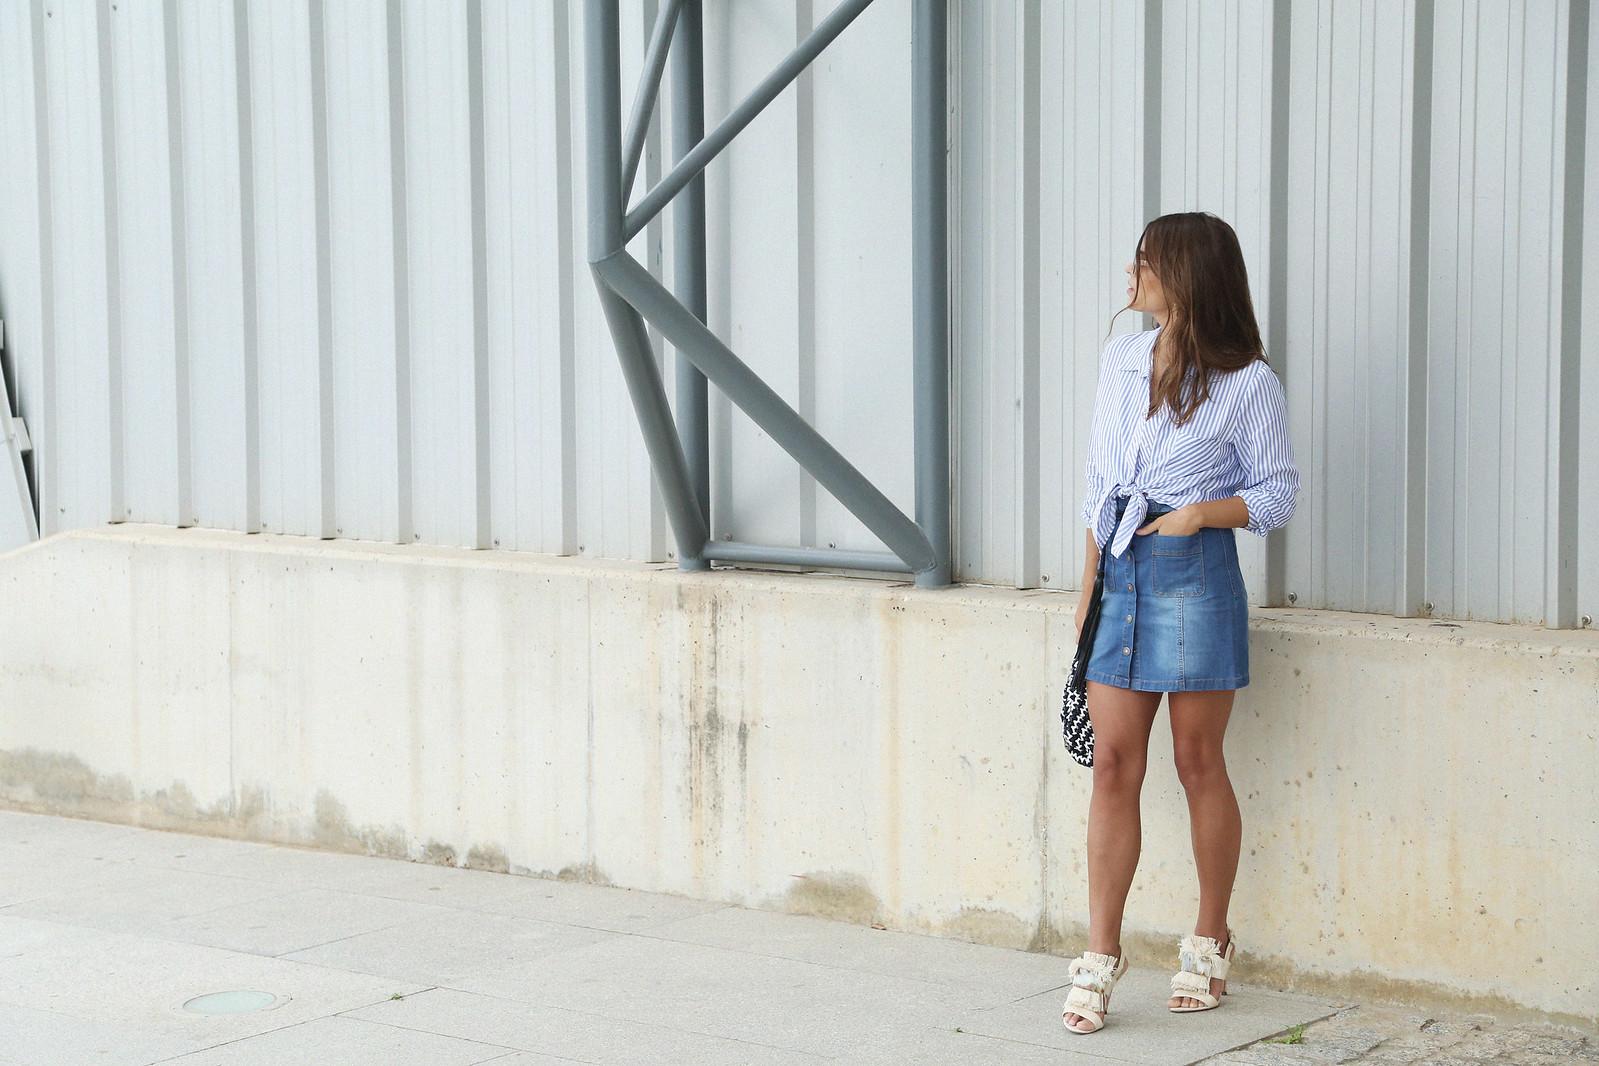 jessie chanes seams for a desire denim skirt stripes shirt-3